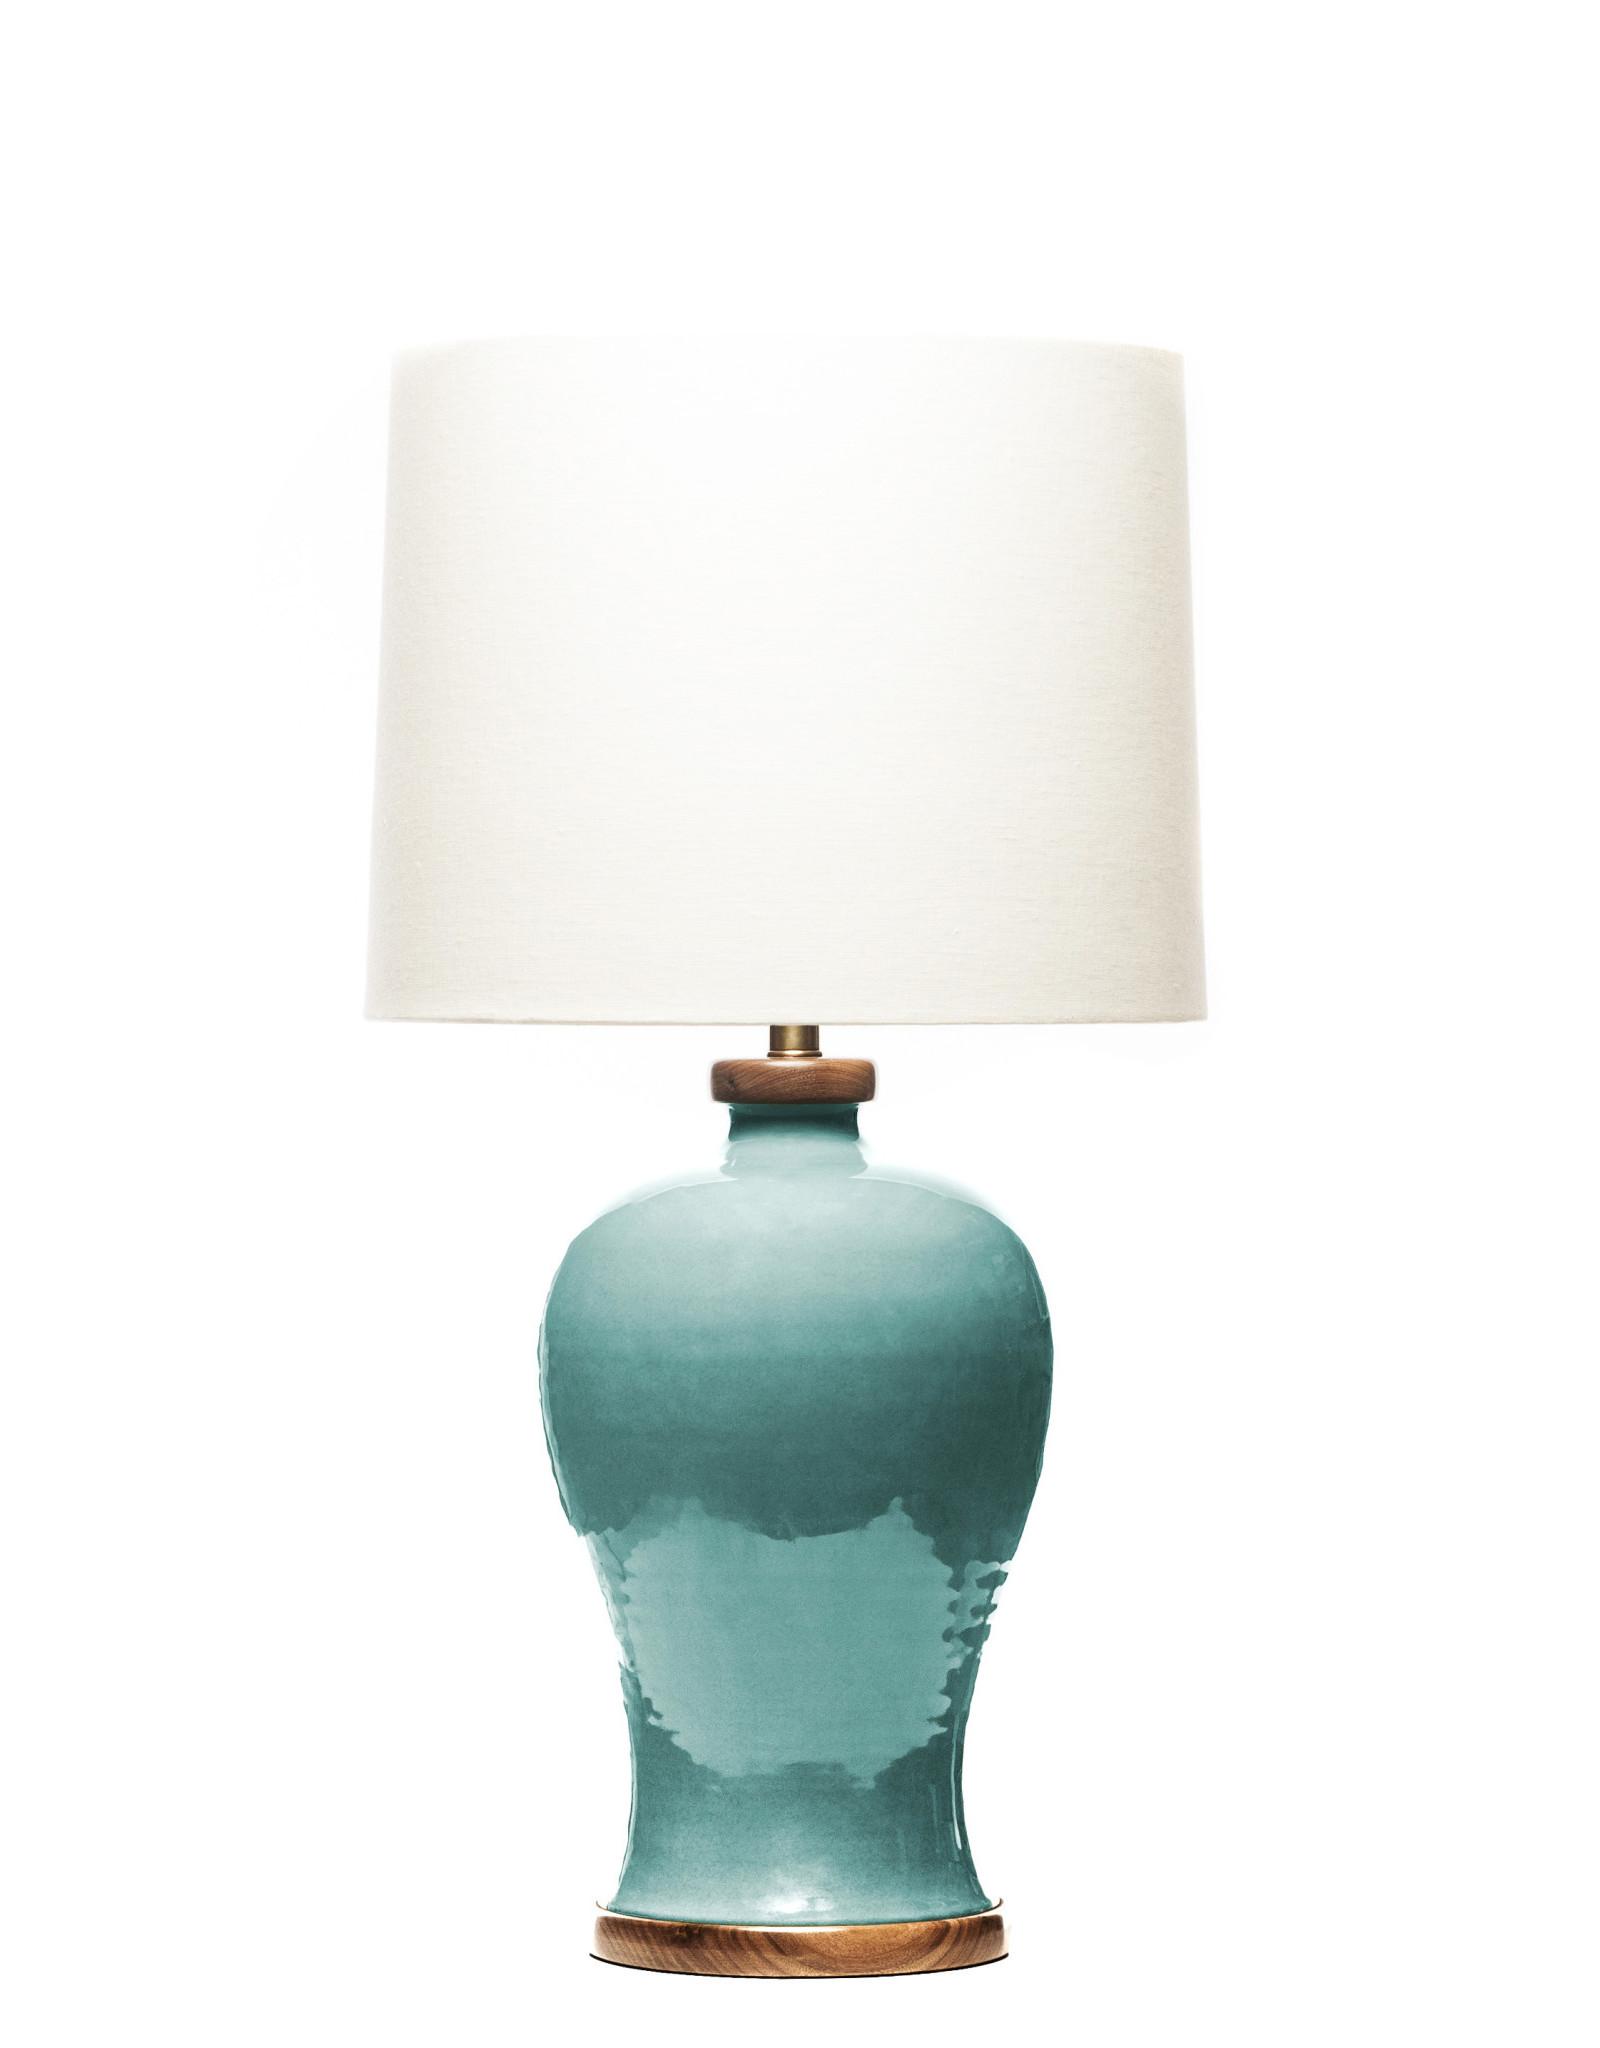 Lawrence & Scott Dashiell Table Lamp in Aquamarine with Walnut Base